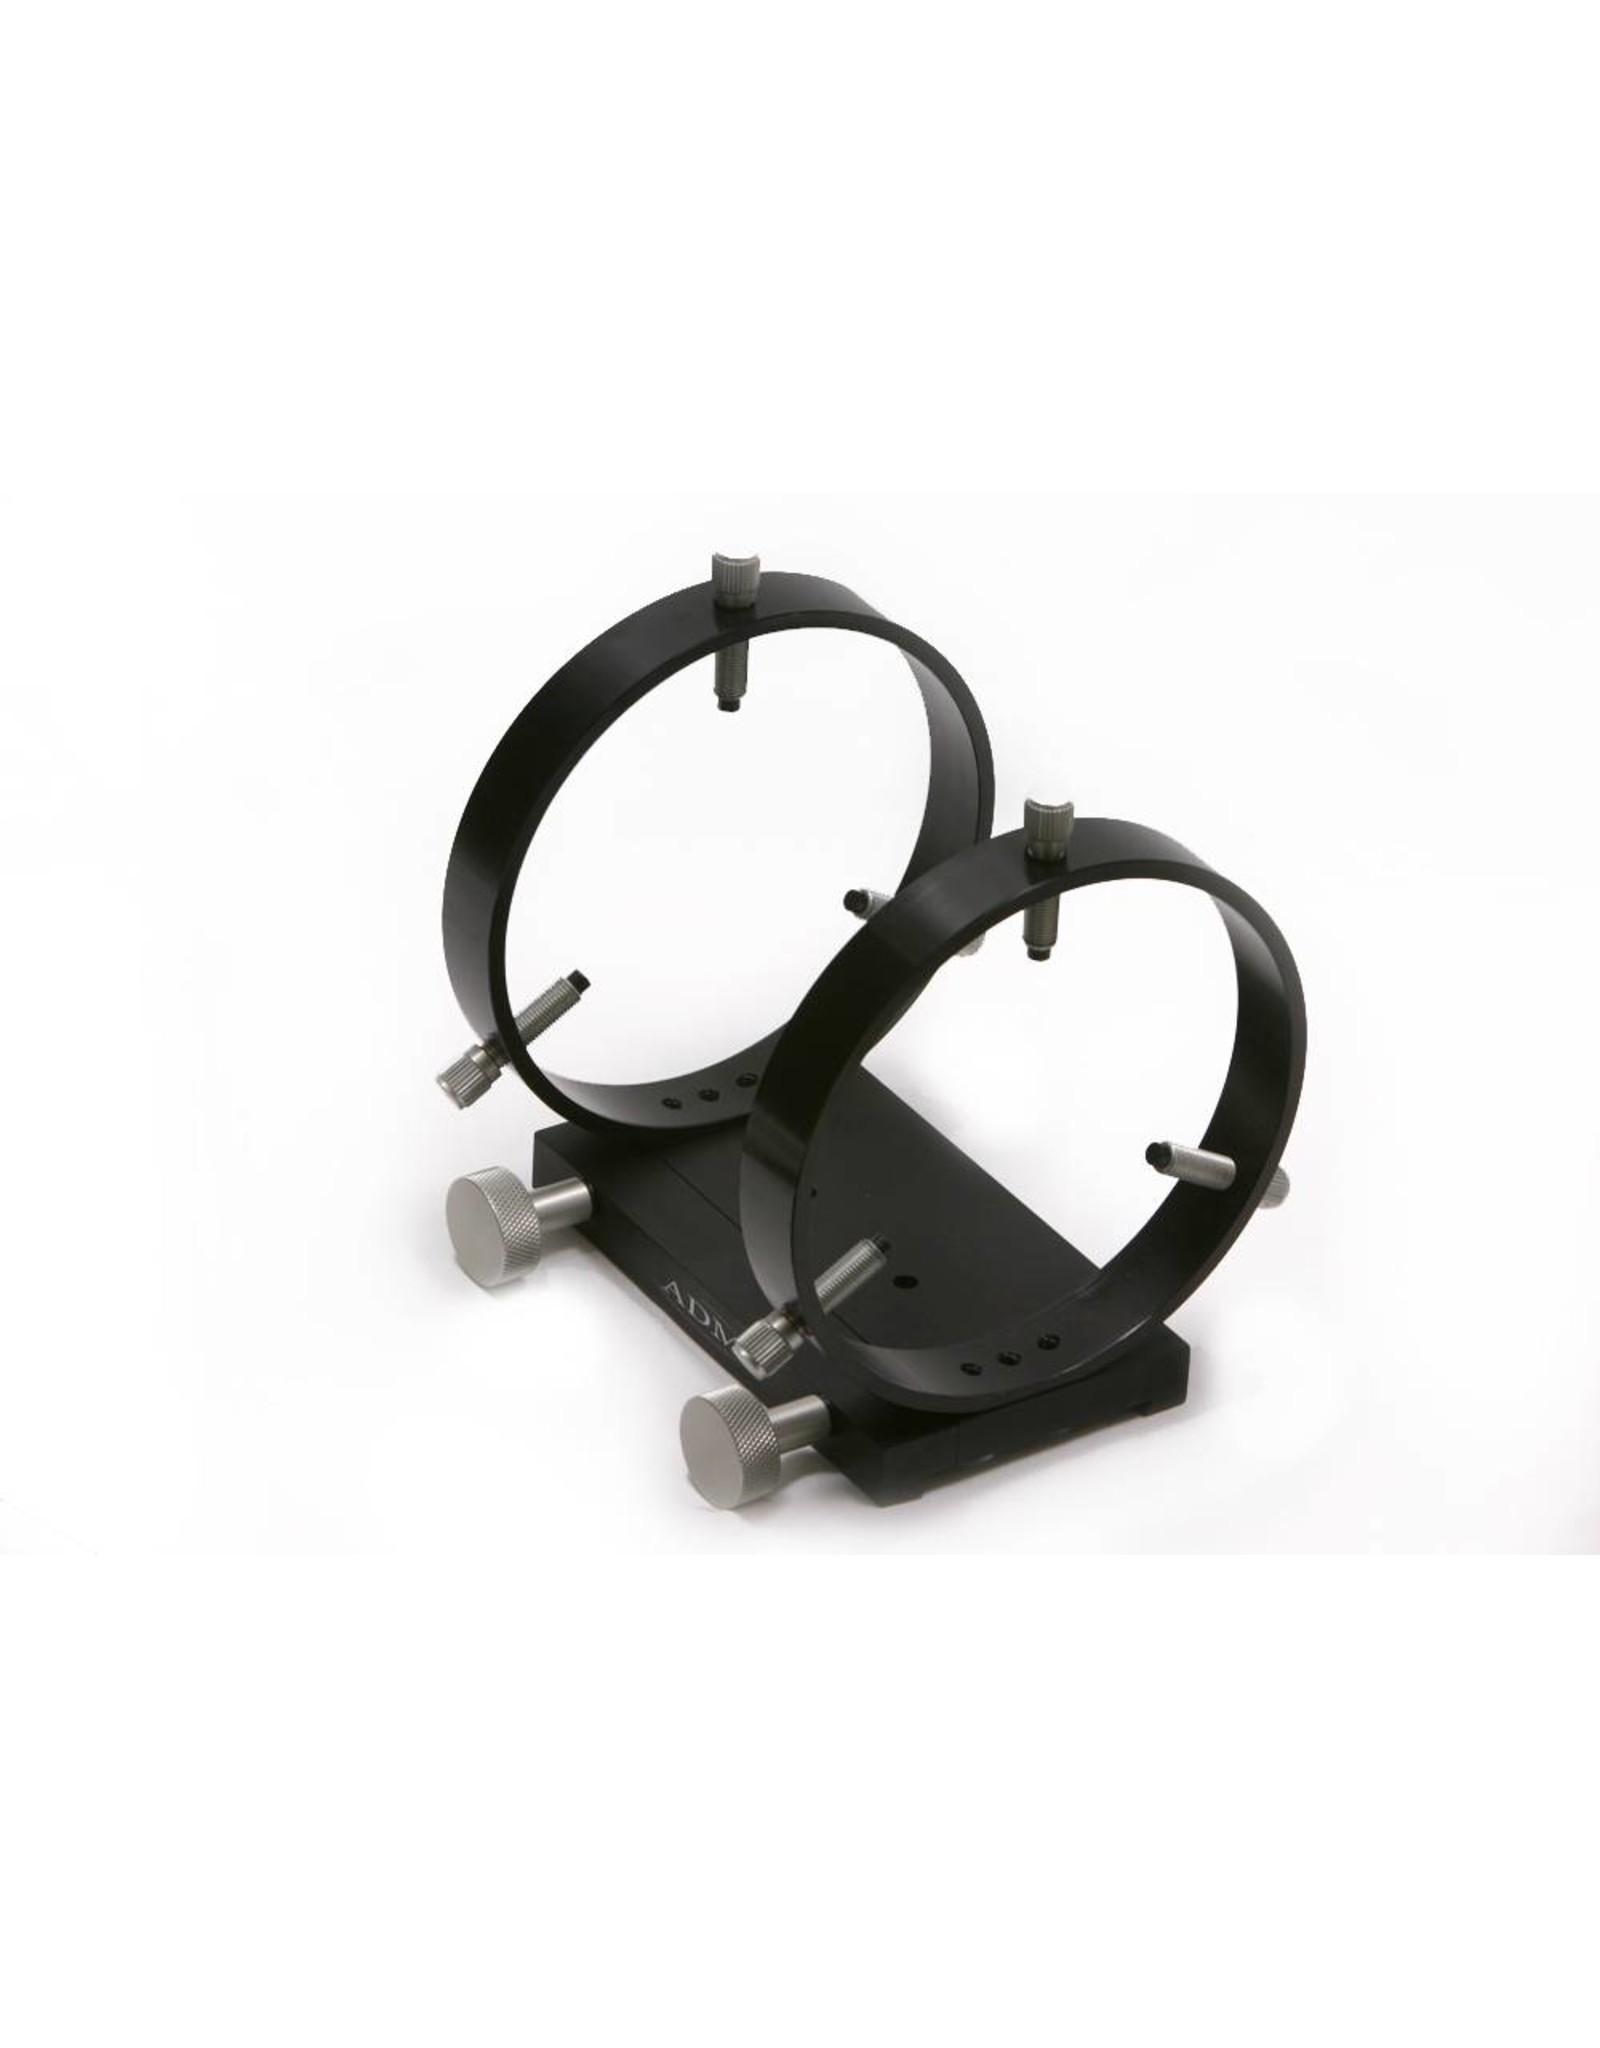 ADM ADM D Series Single Ring Set